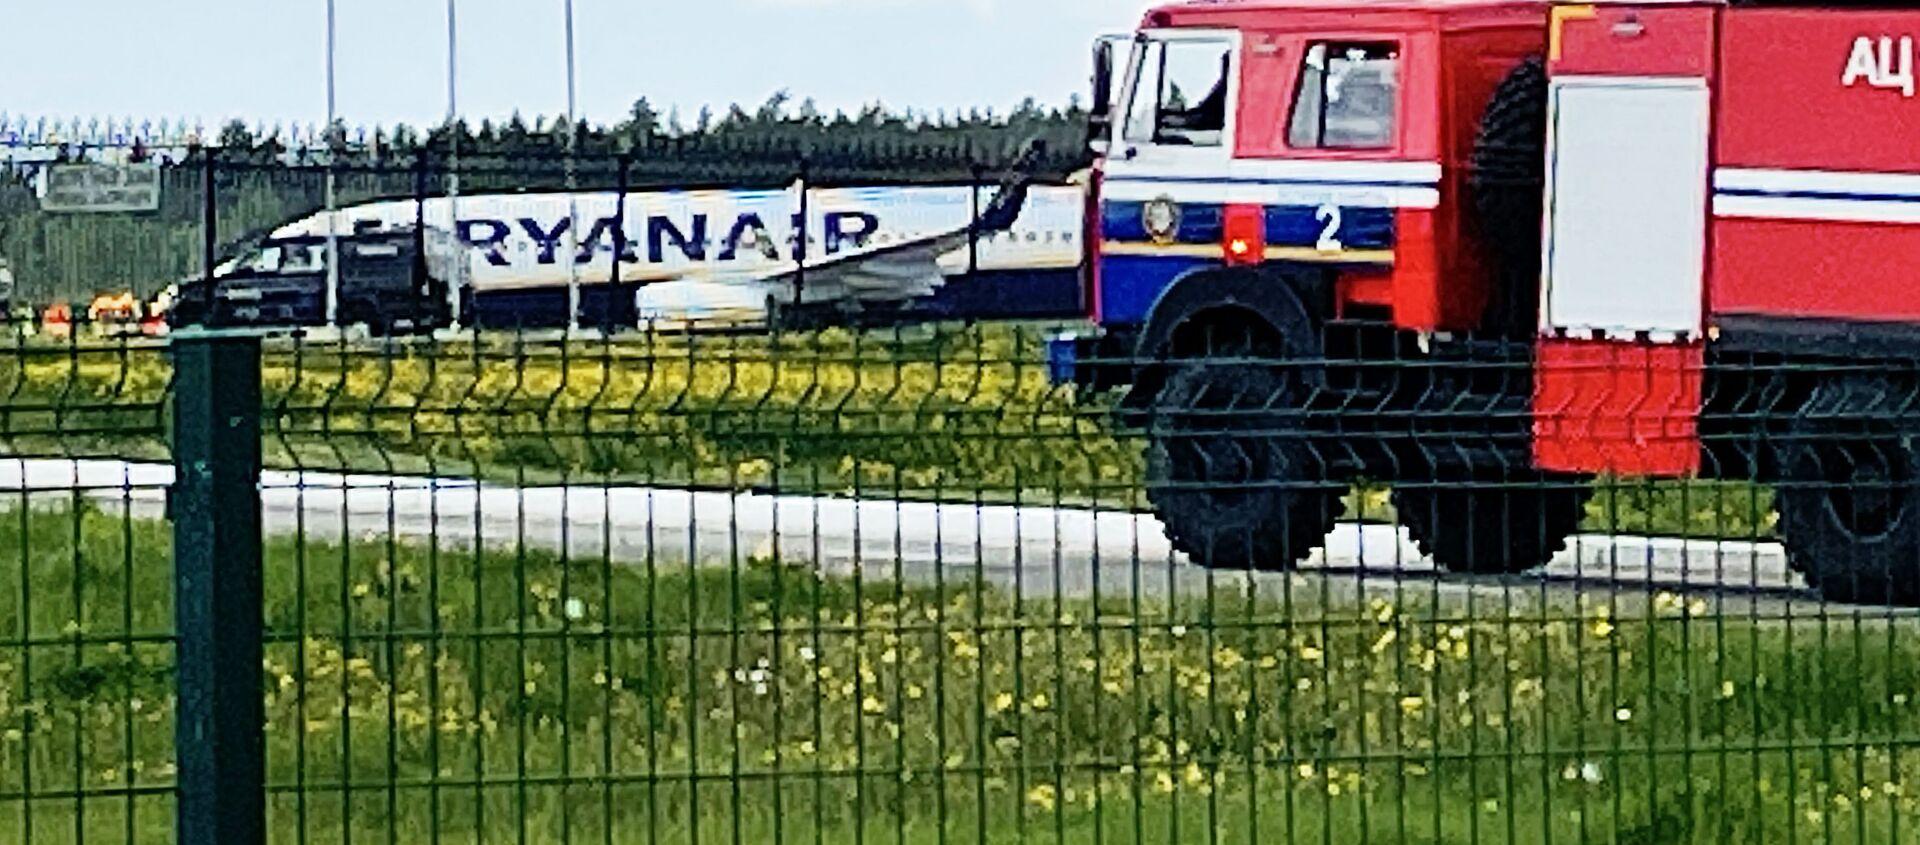 Samolot Ryanair w Mińsku - Sputnik Polska, 1920, 24.05.2021